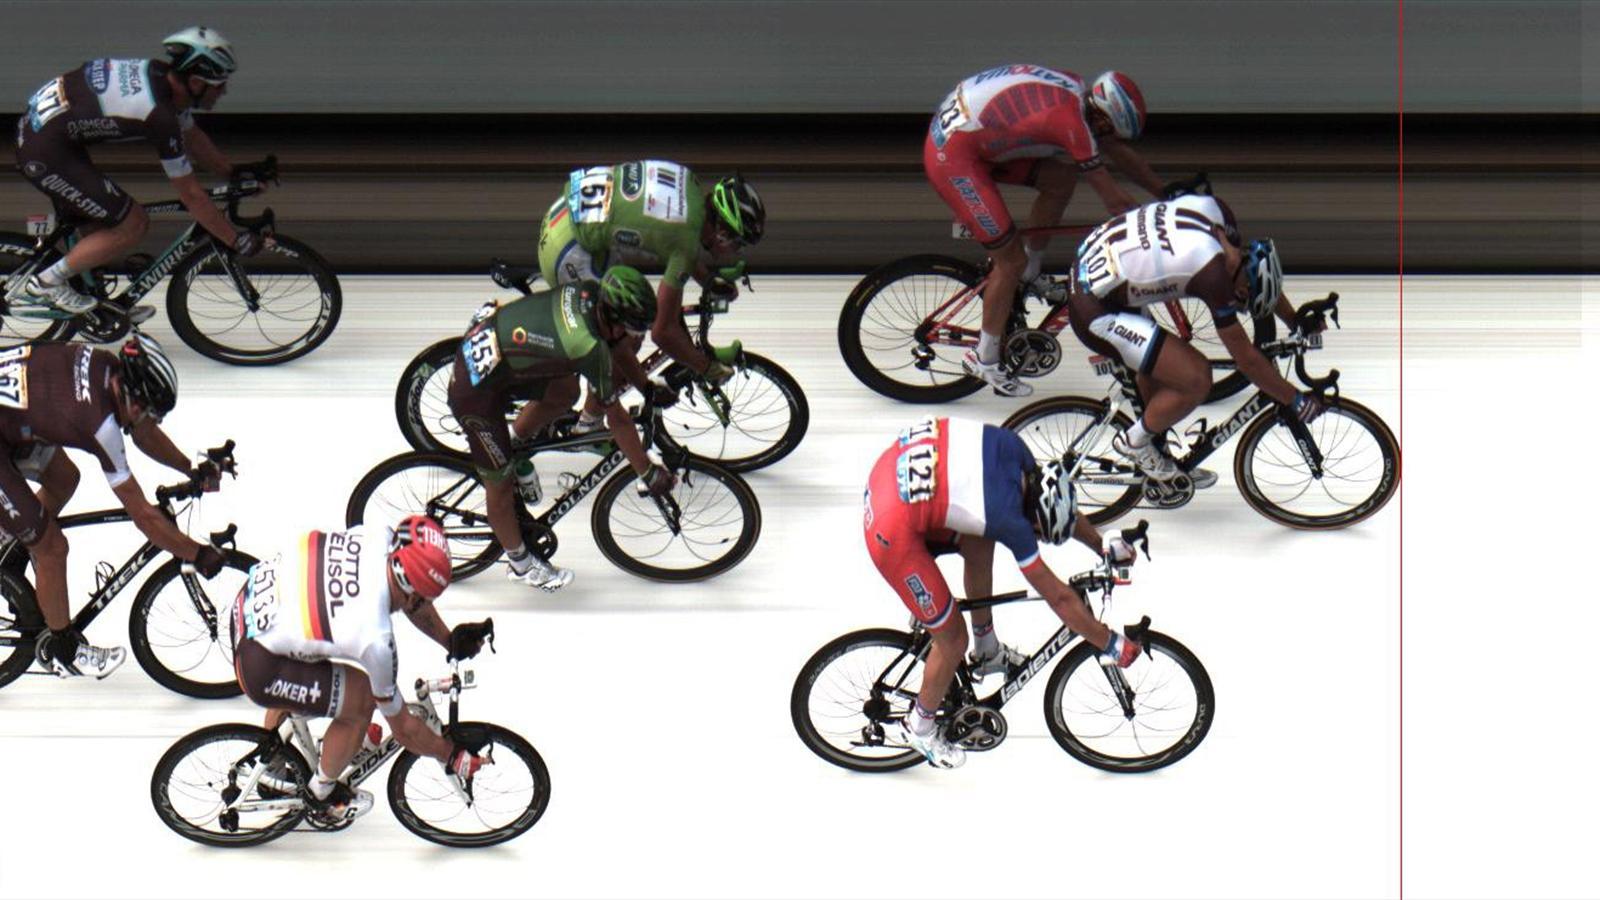 cyclisme sur eurosport